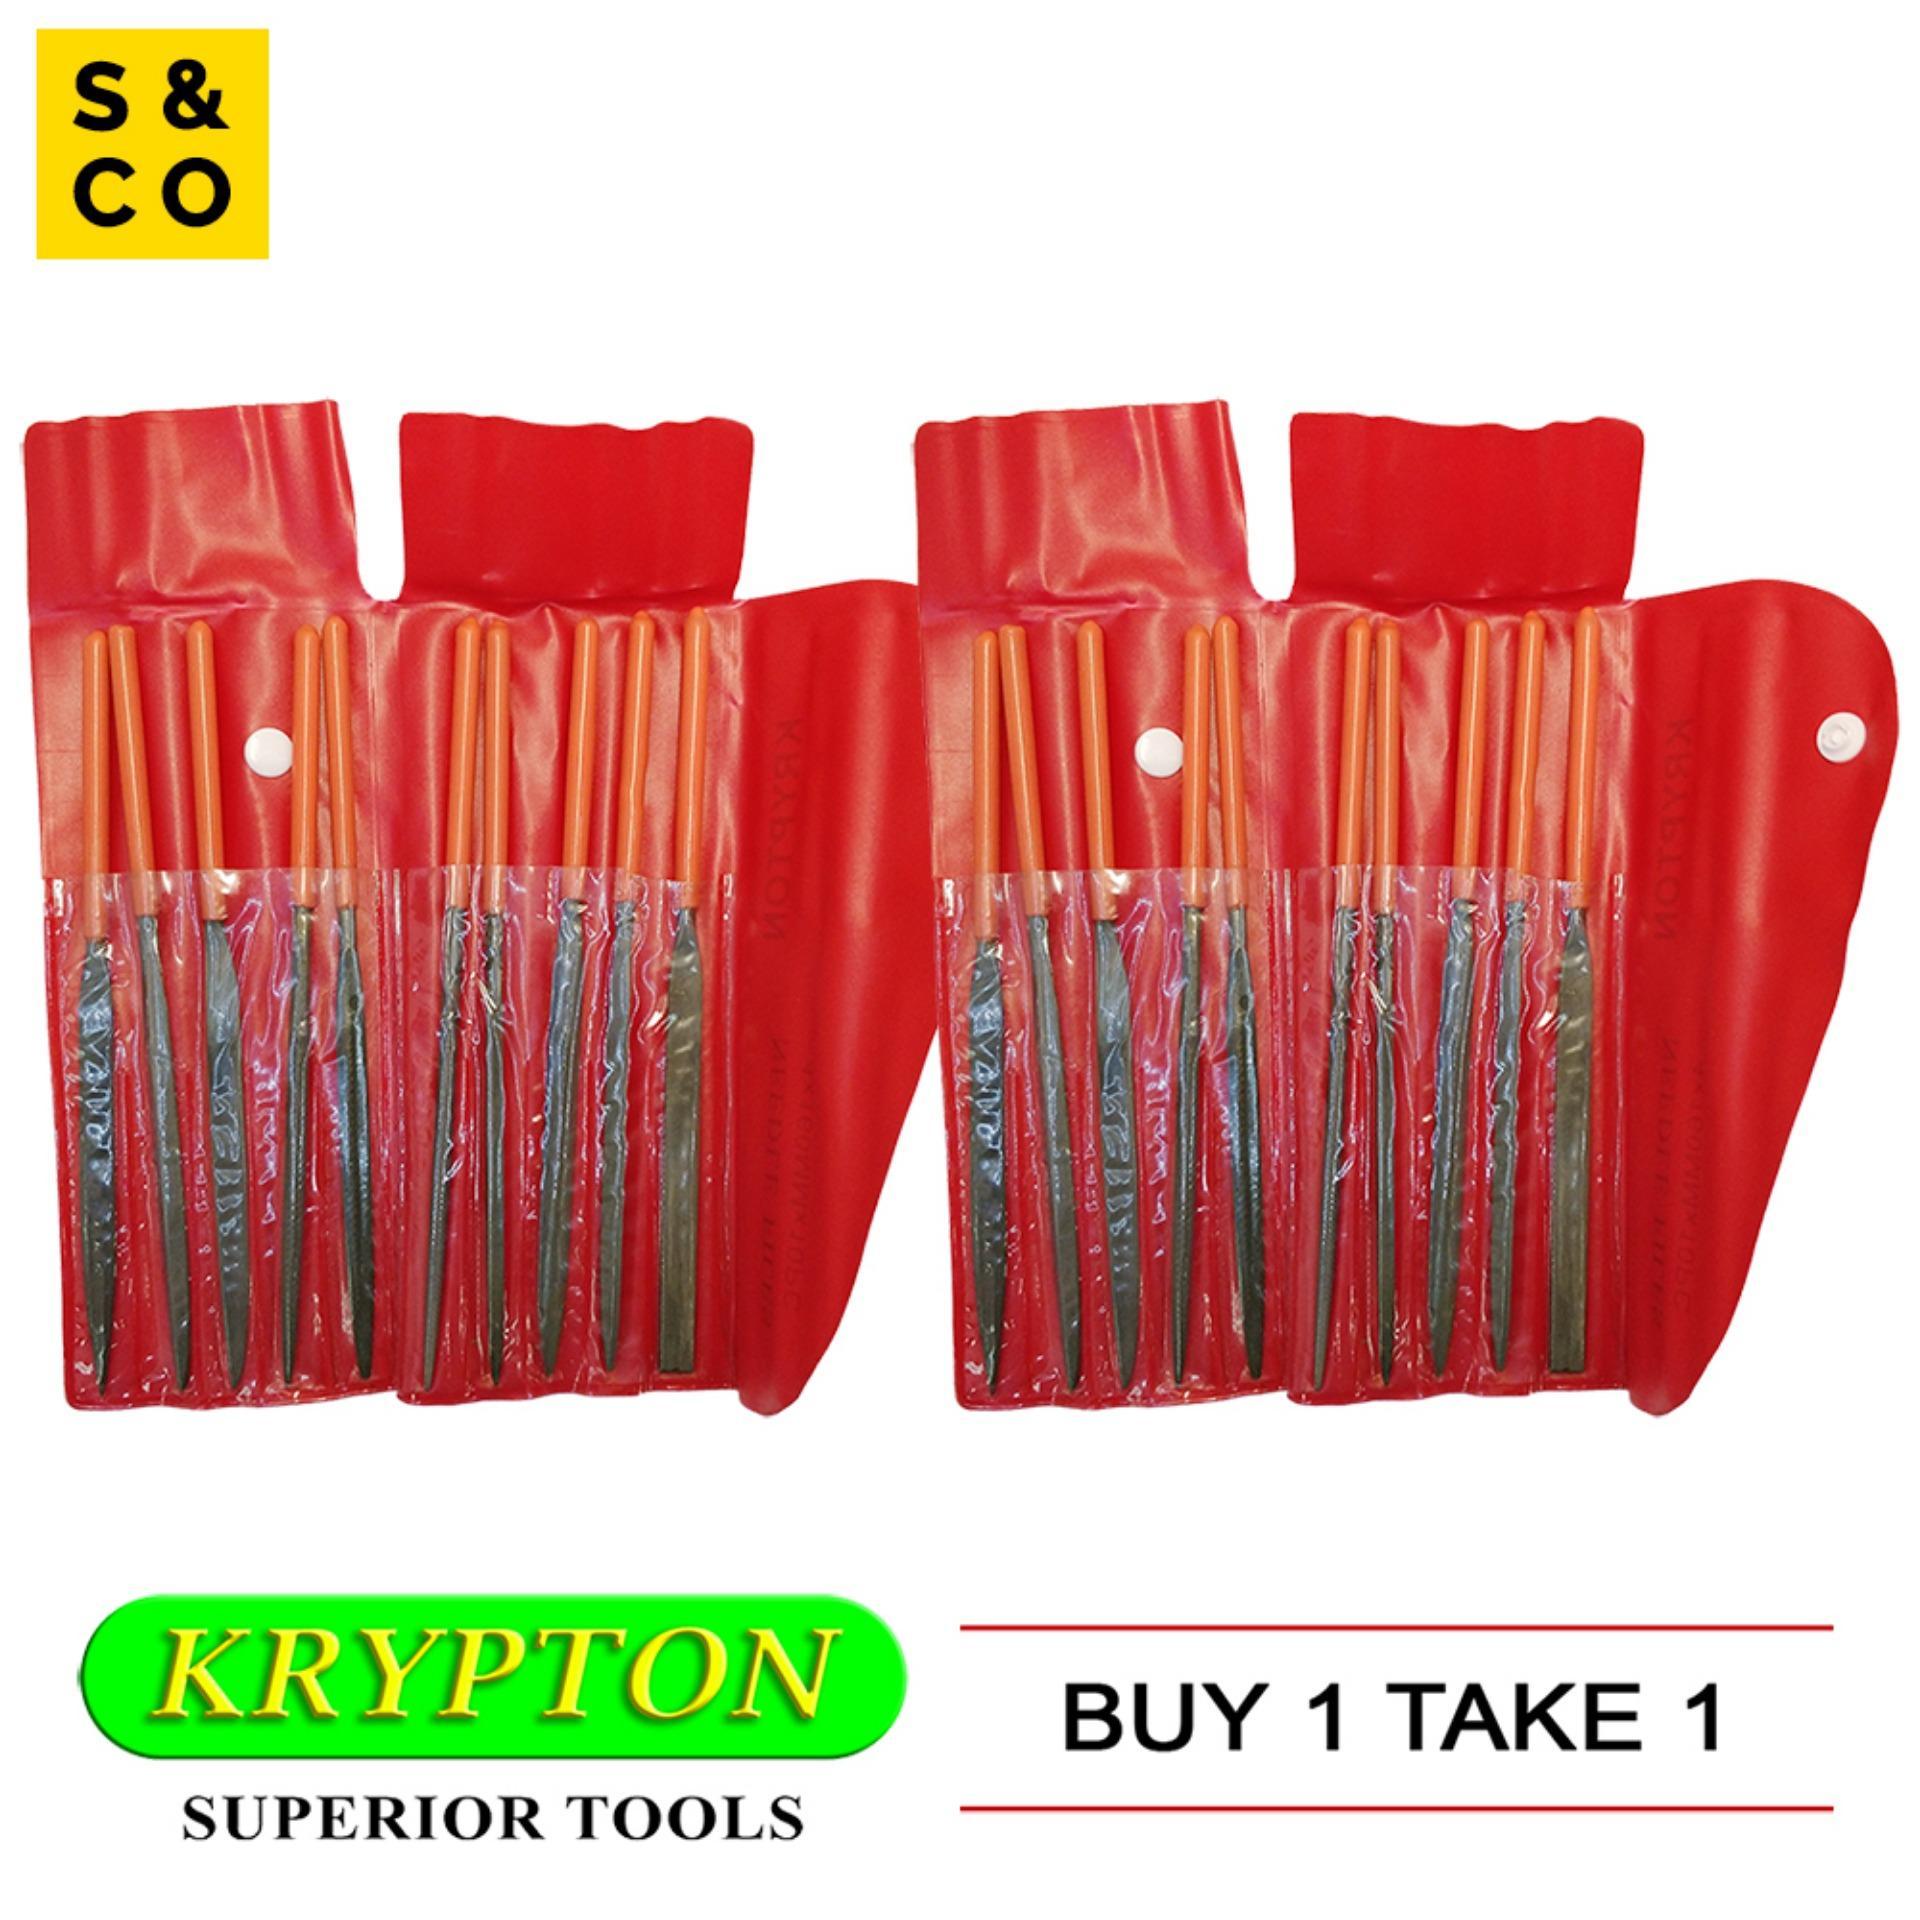 Krypton Needle File Set (160 mm x 10 pcs) - BUY 1 TAKE 1